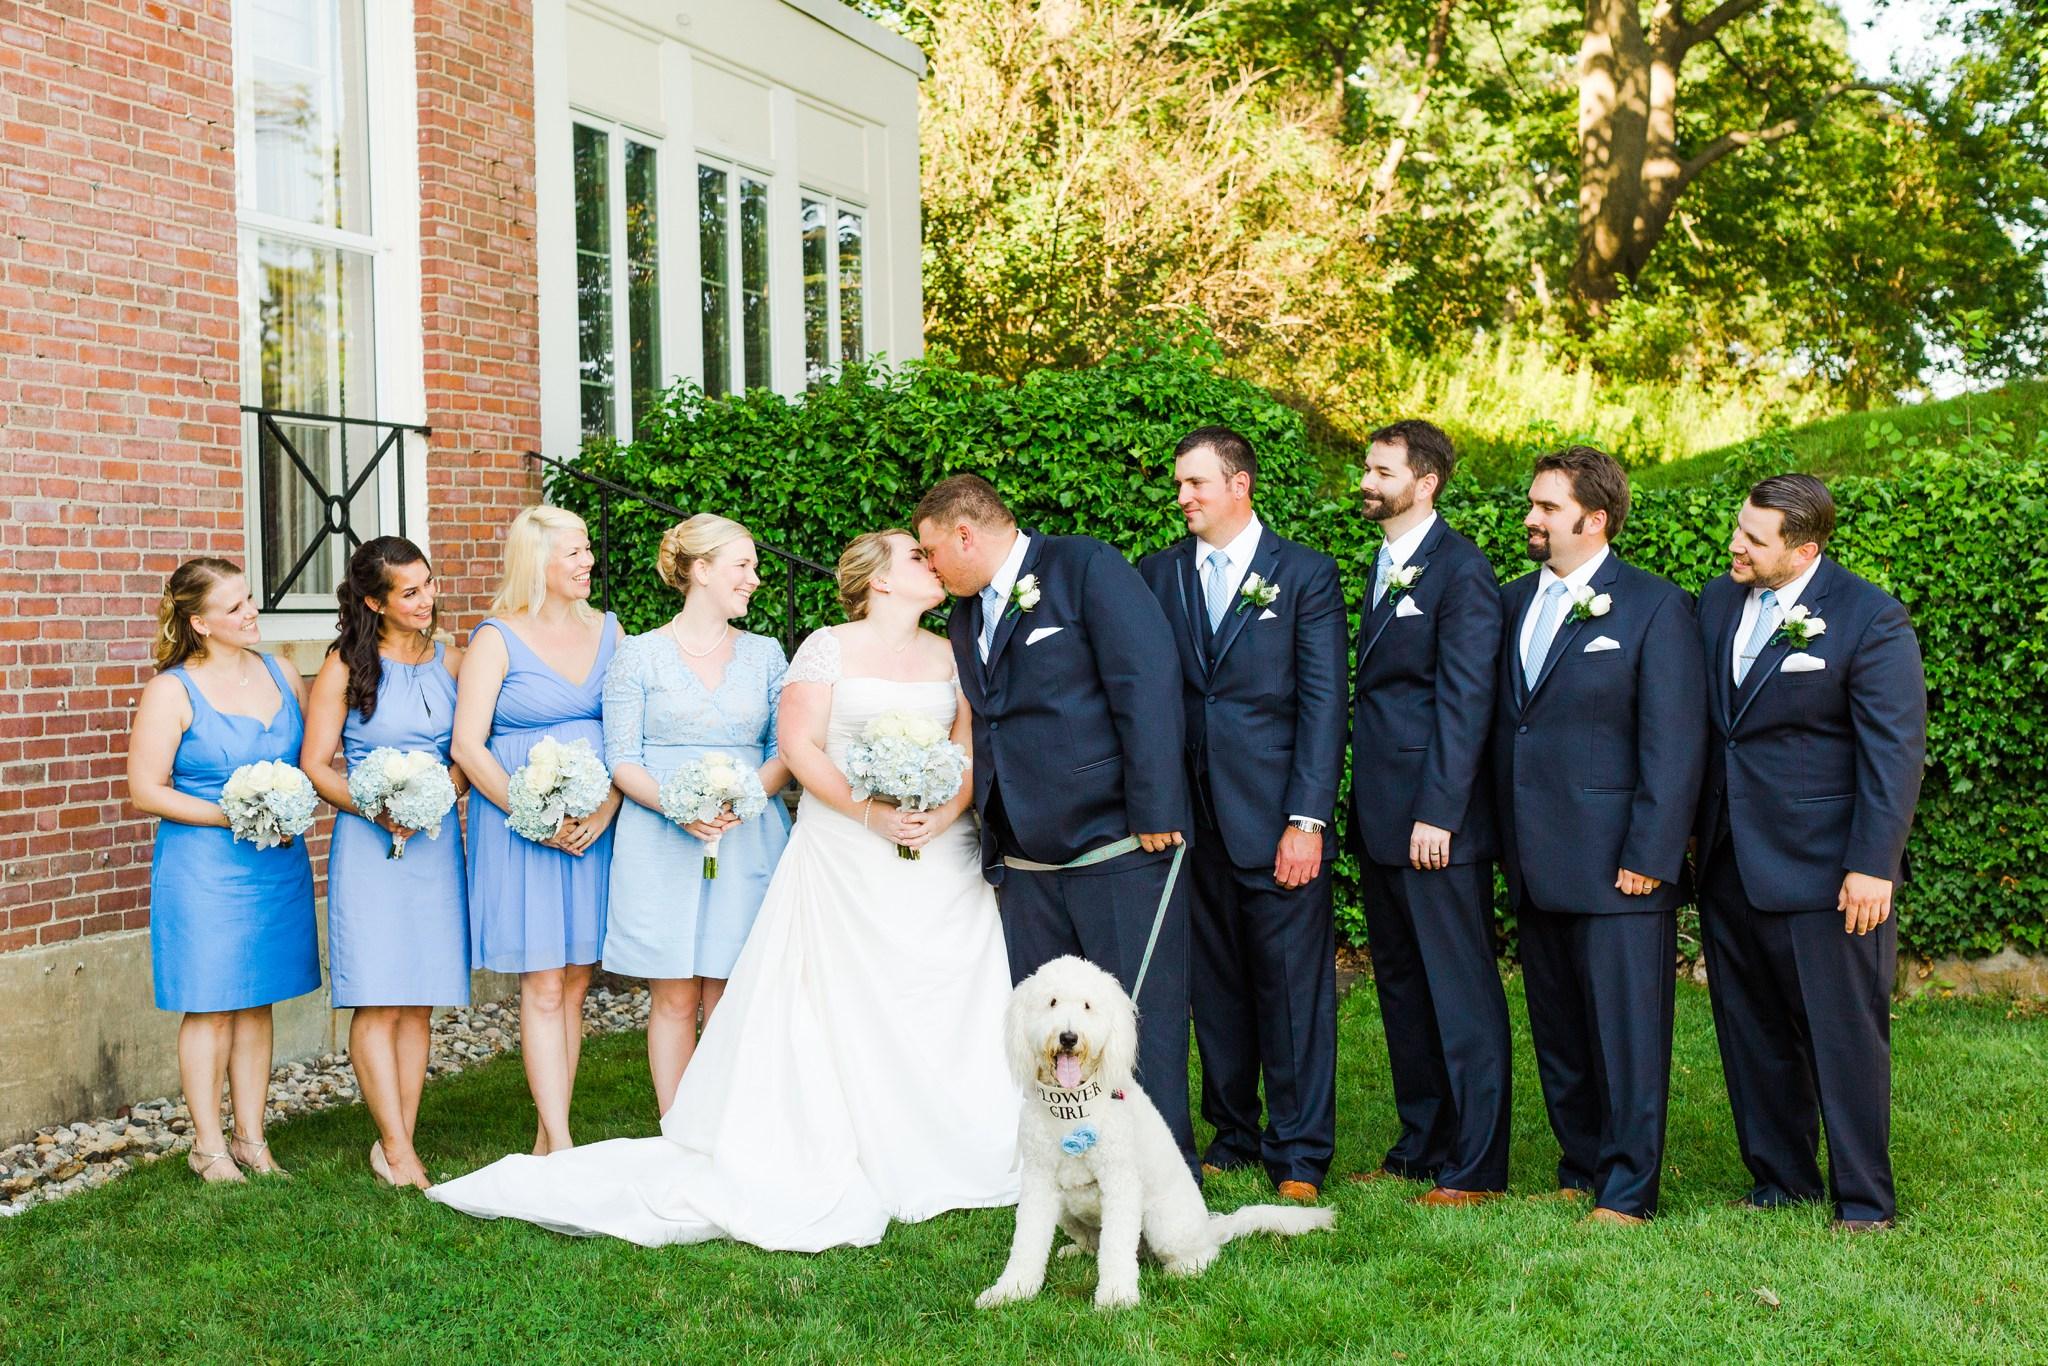 misselwood_endicott_college_wedding_photos_00037.JPG